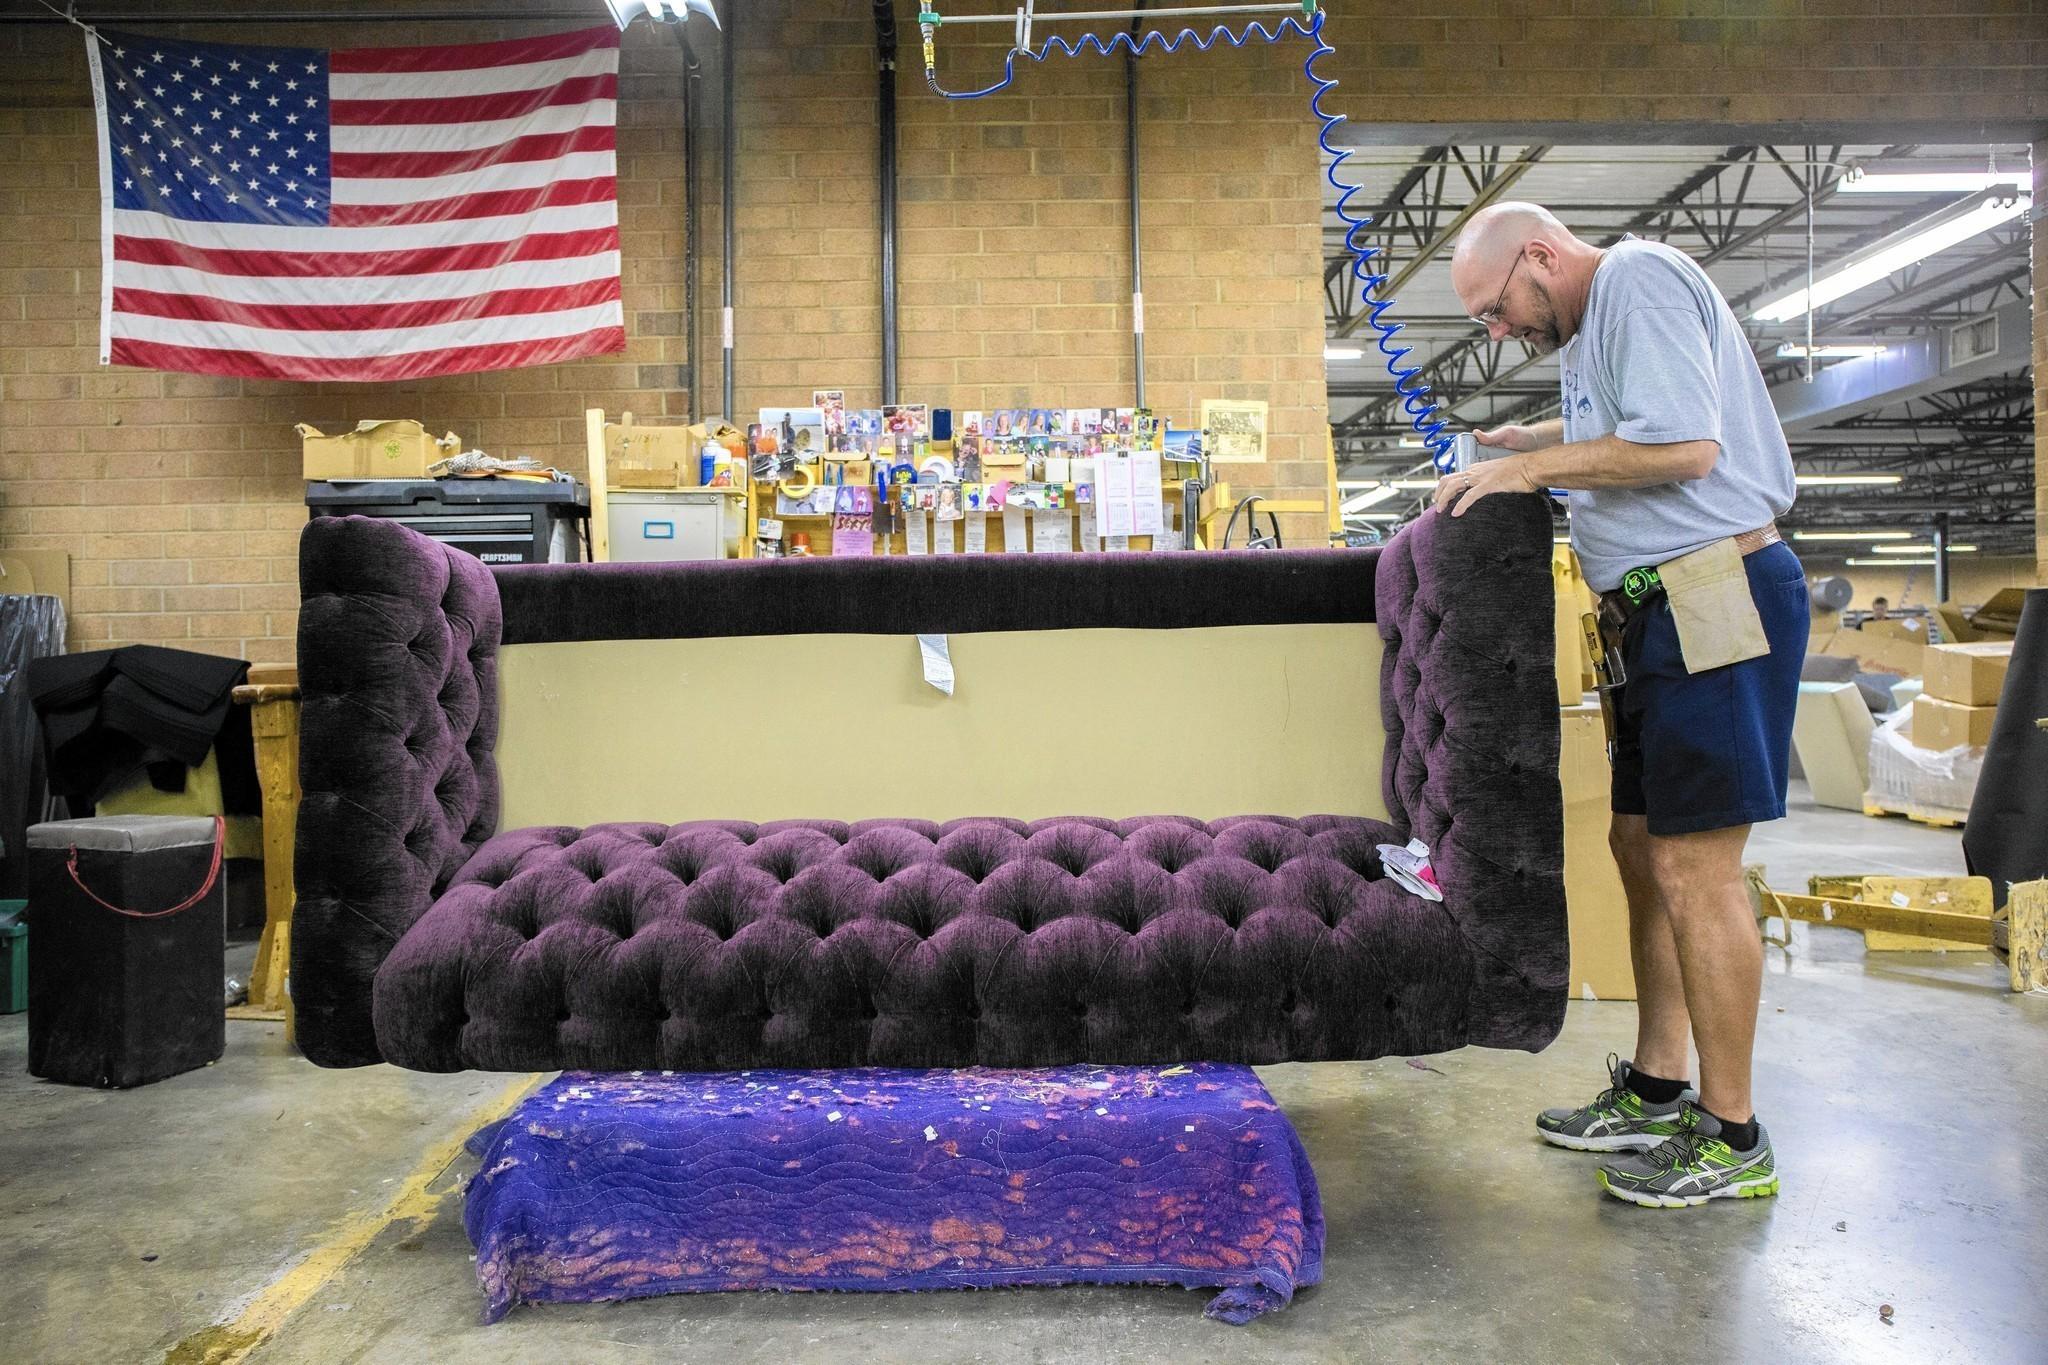 Furniture Firms Shun Flame Retardants But Some Toxic